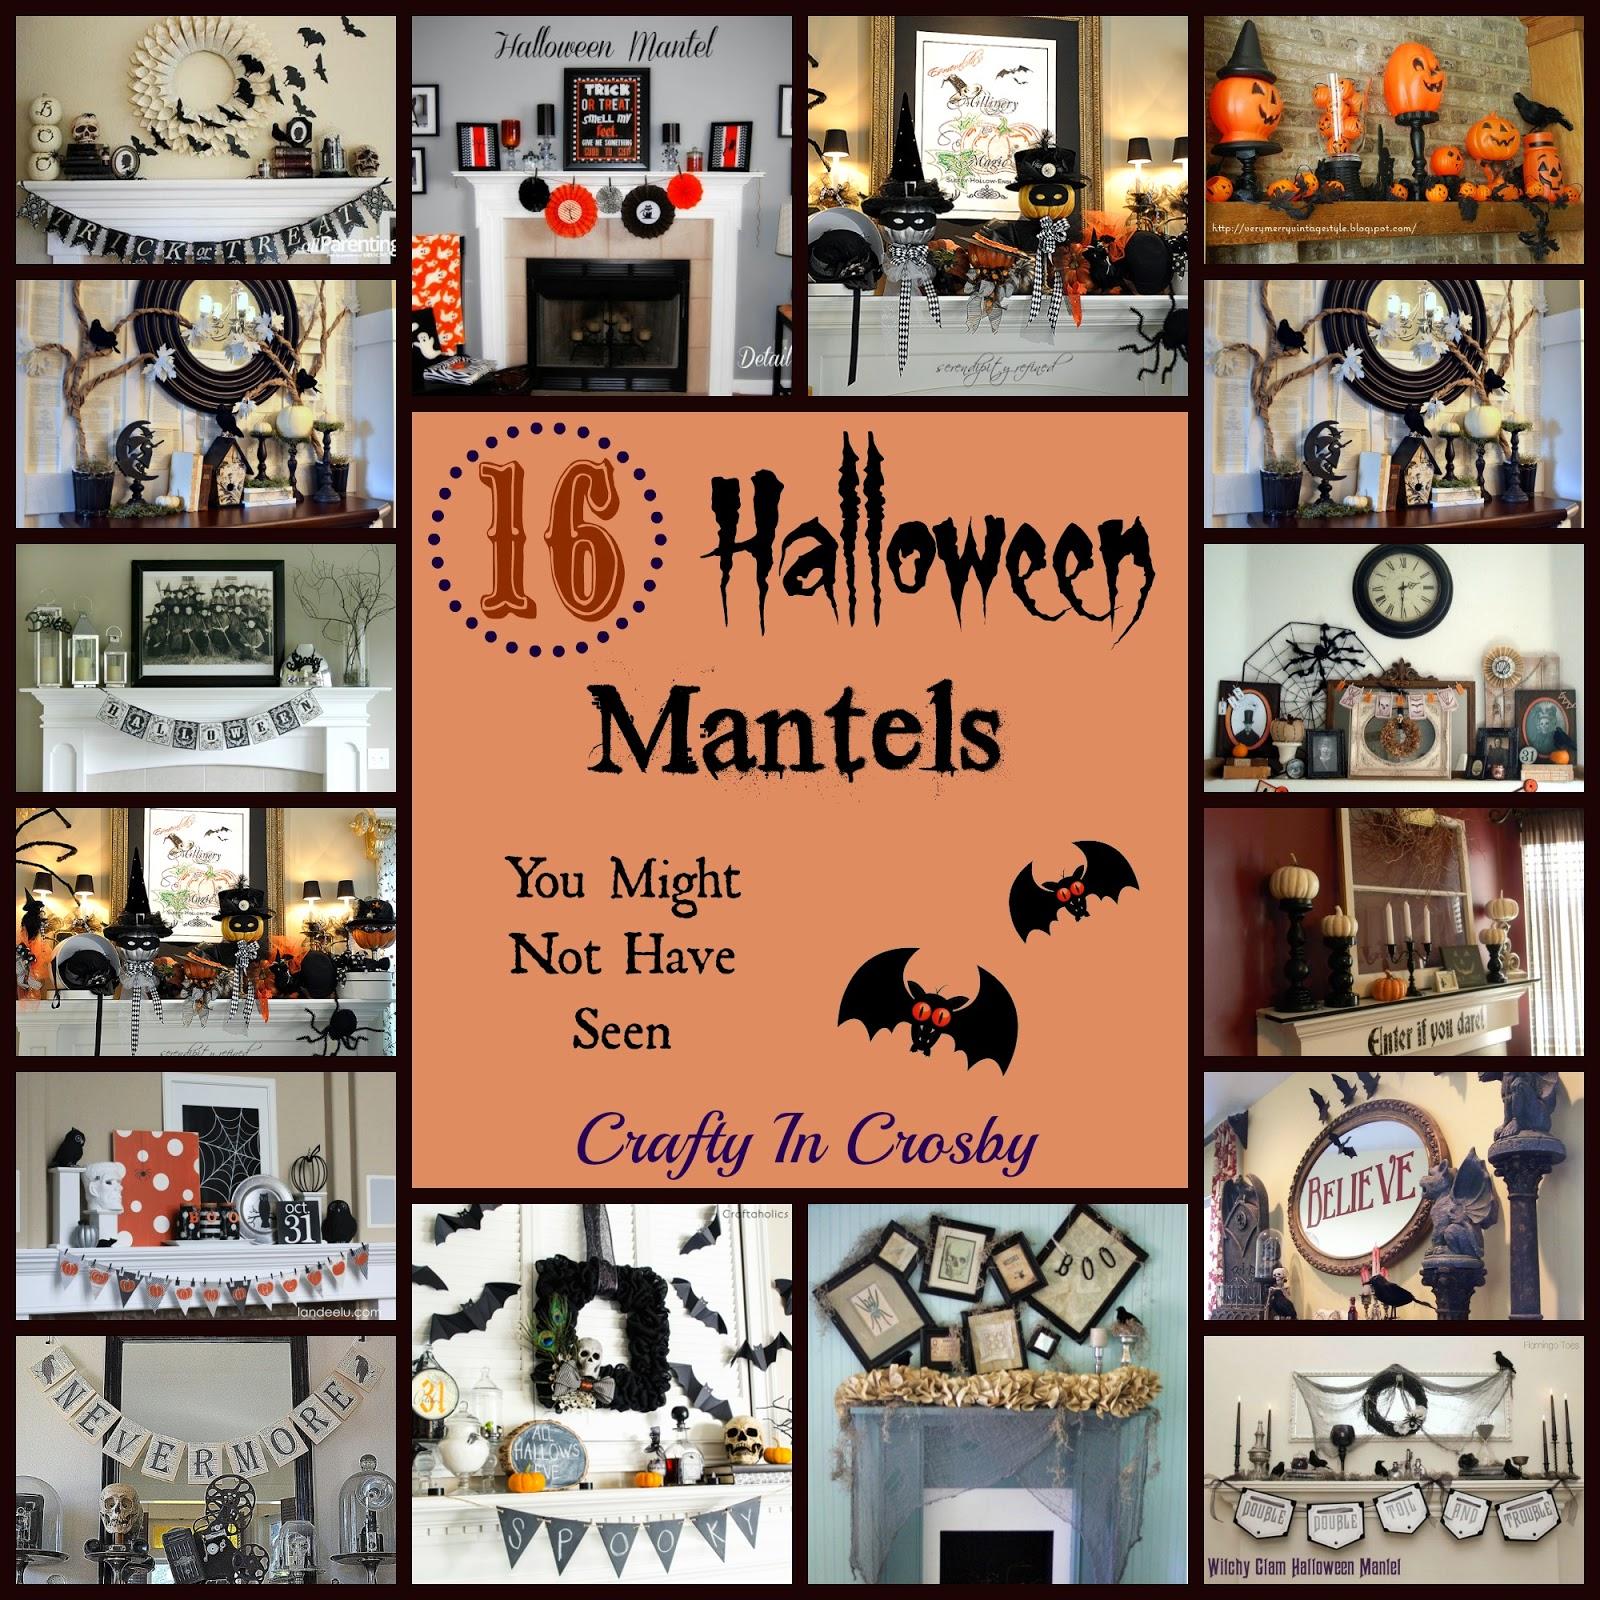 spooky mantel, easy Halloween mantels, Halloween mantel roundup